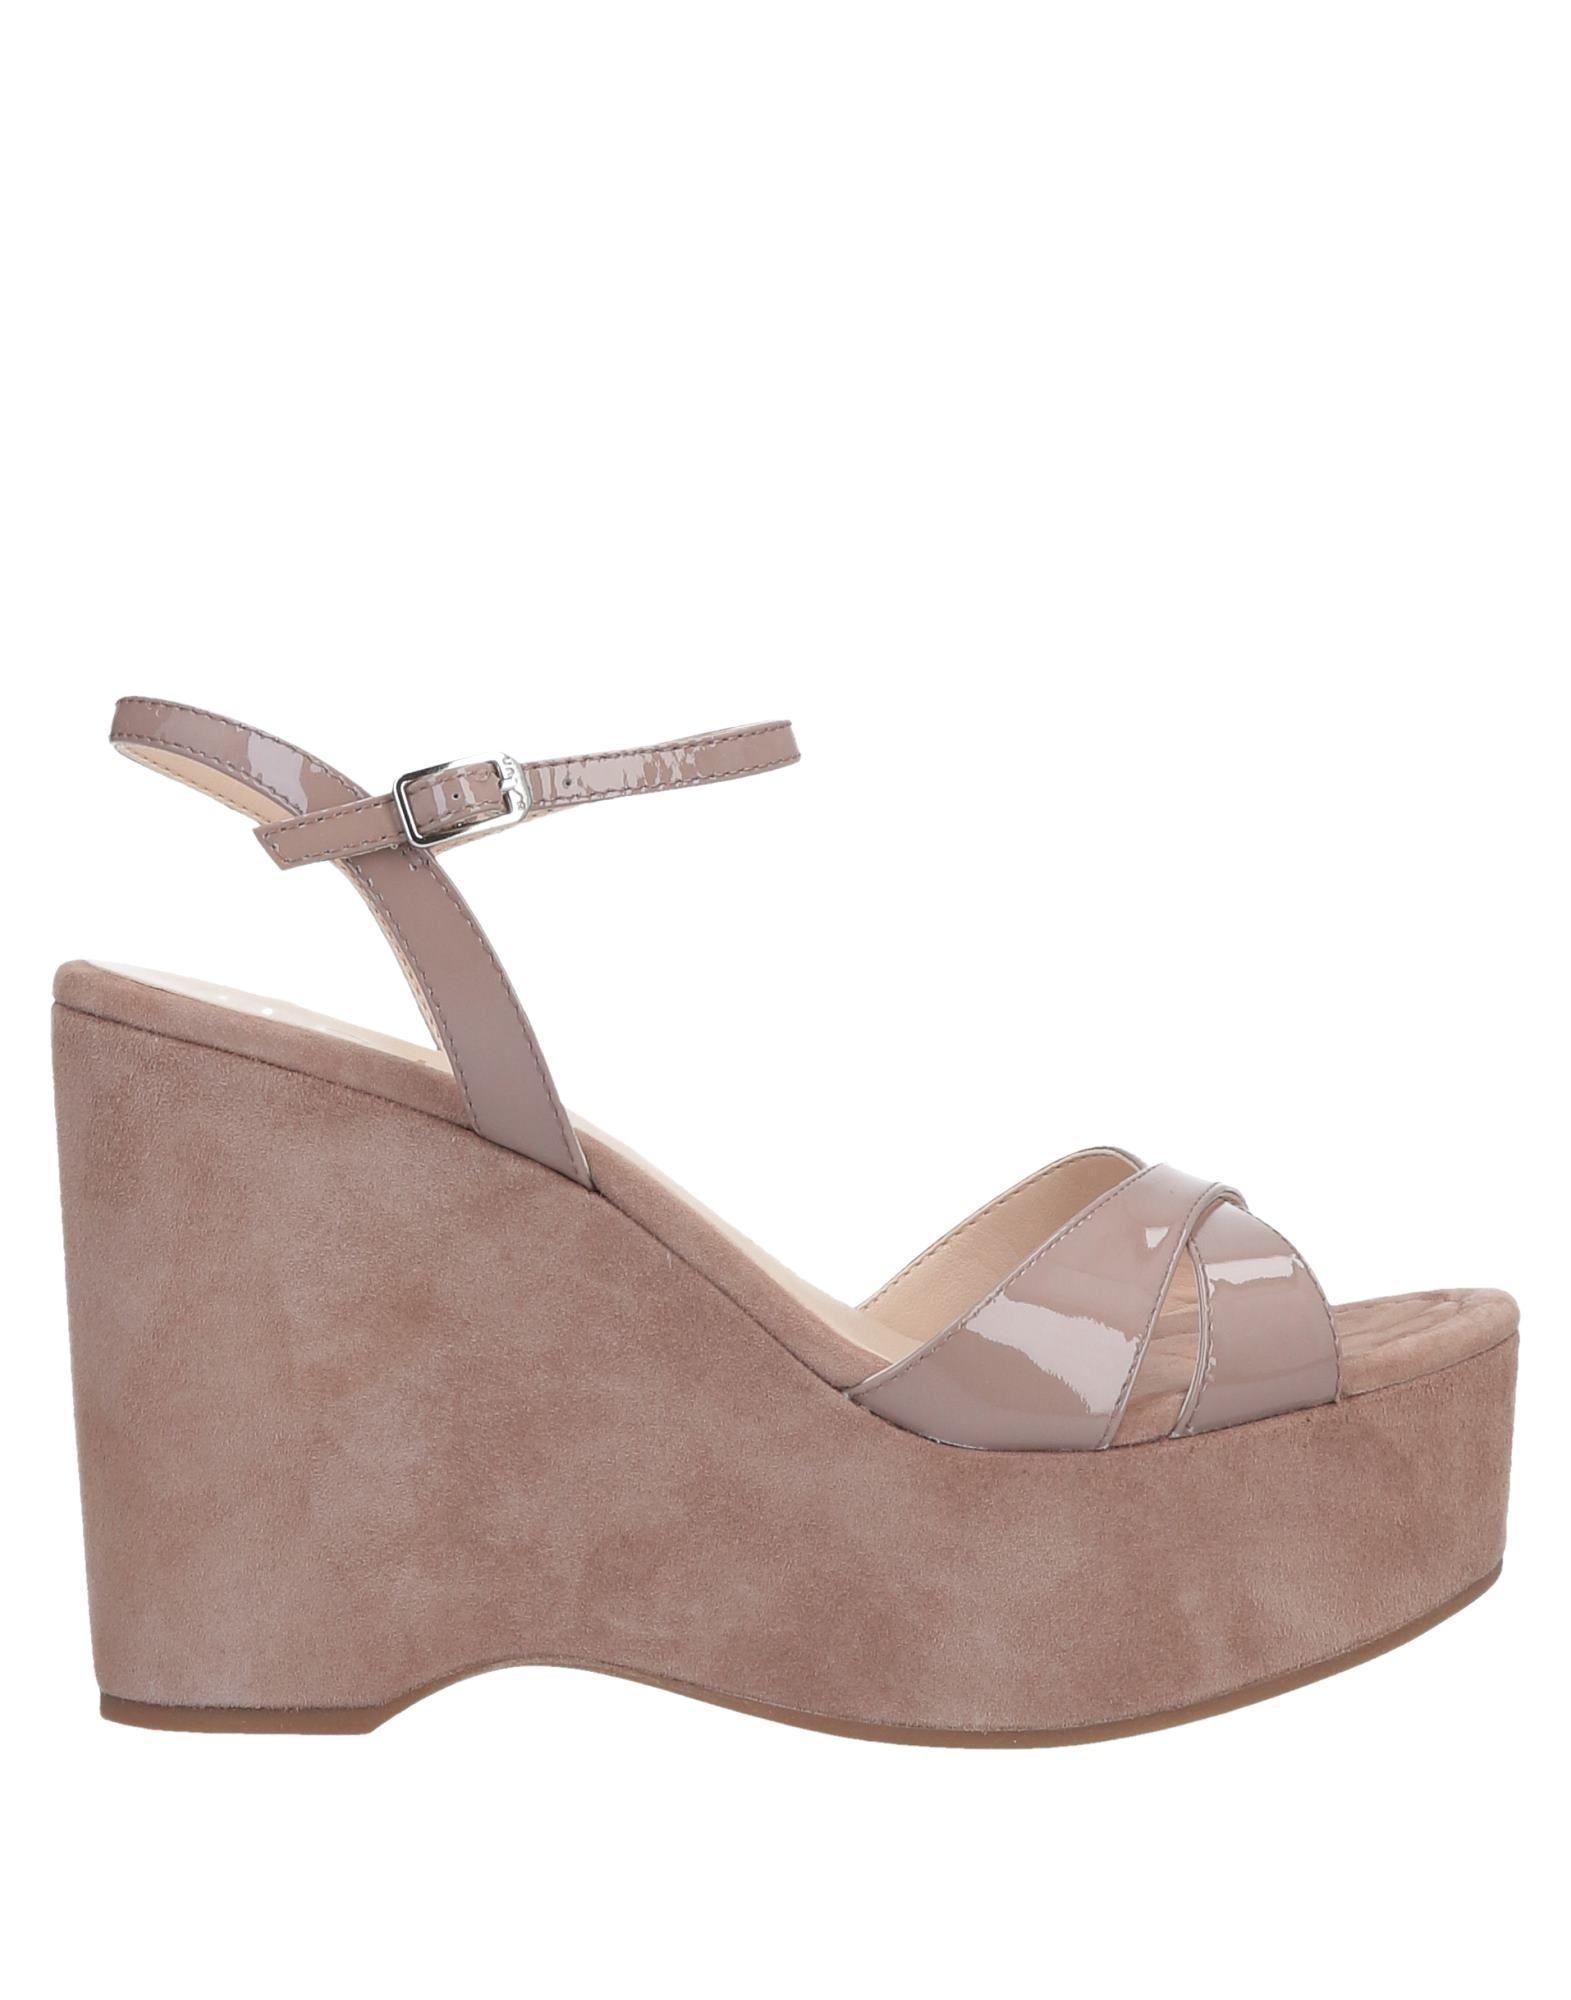 898228c539fe Lyst - Unisa Sandals in Gray